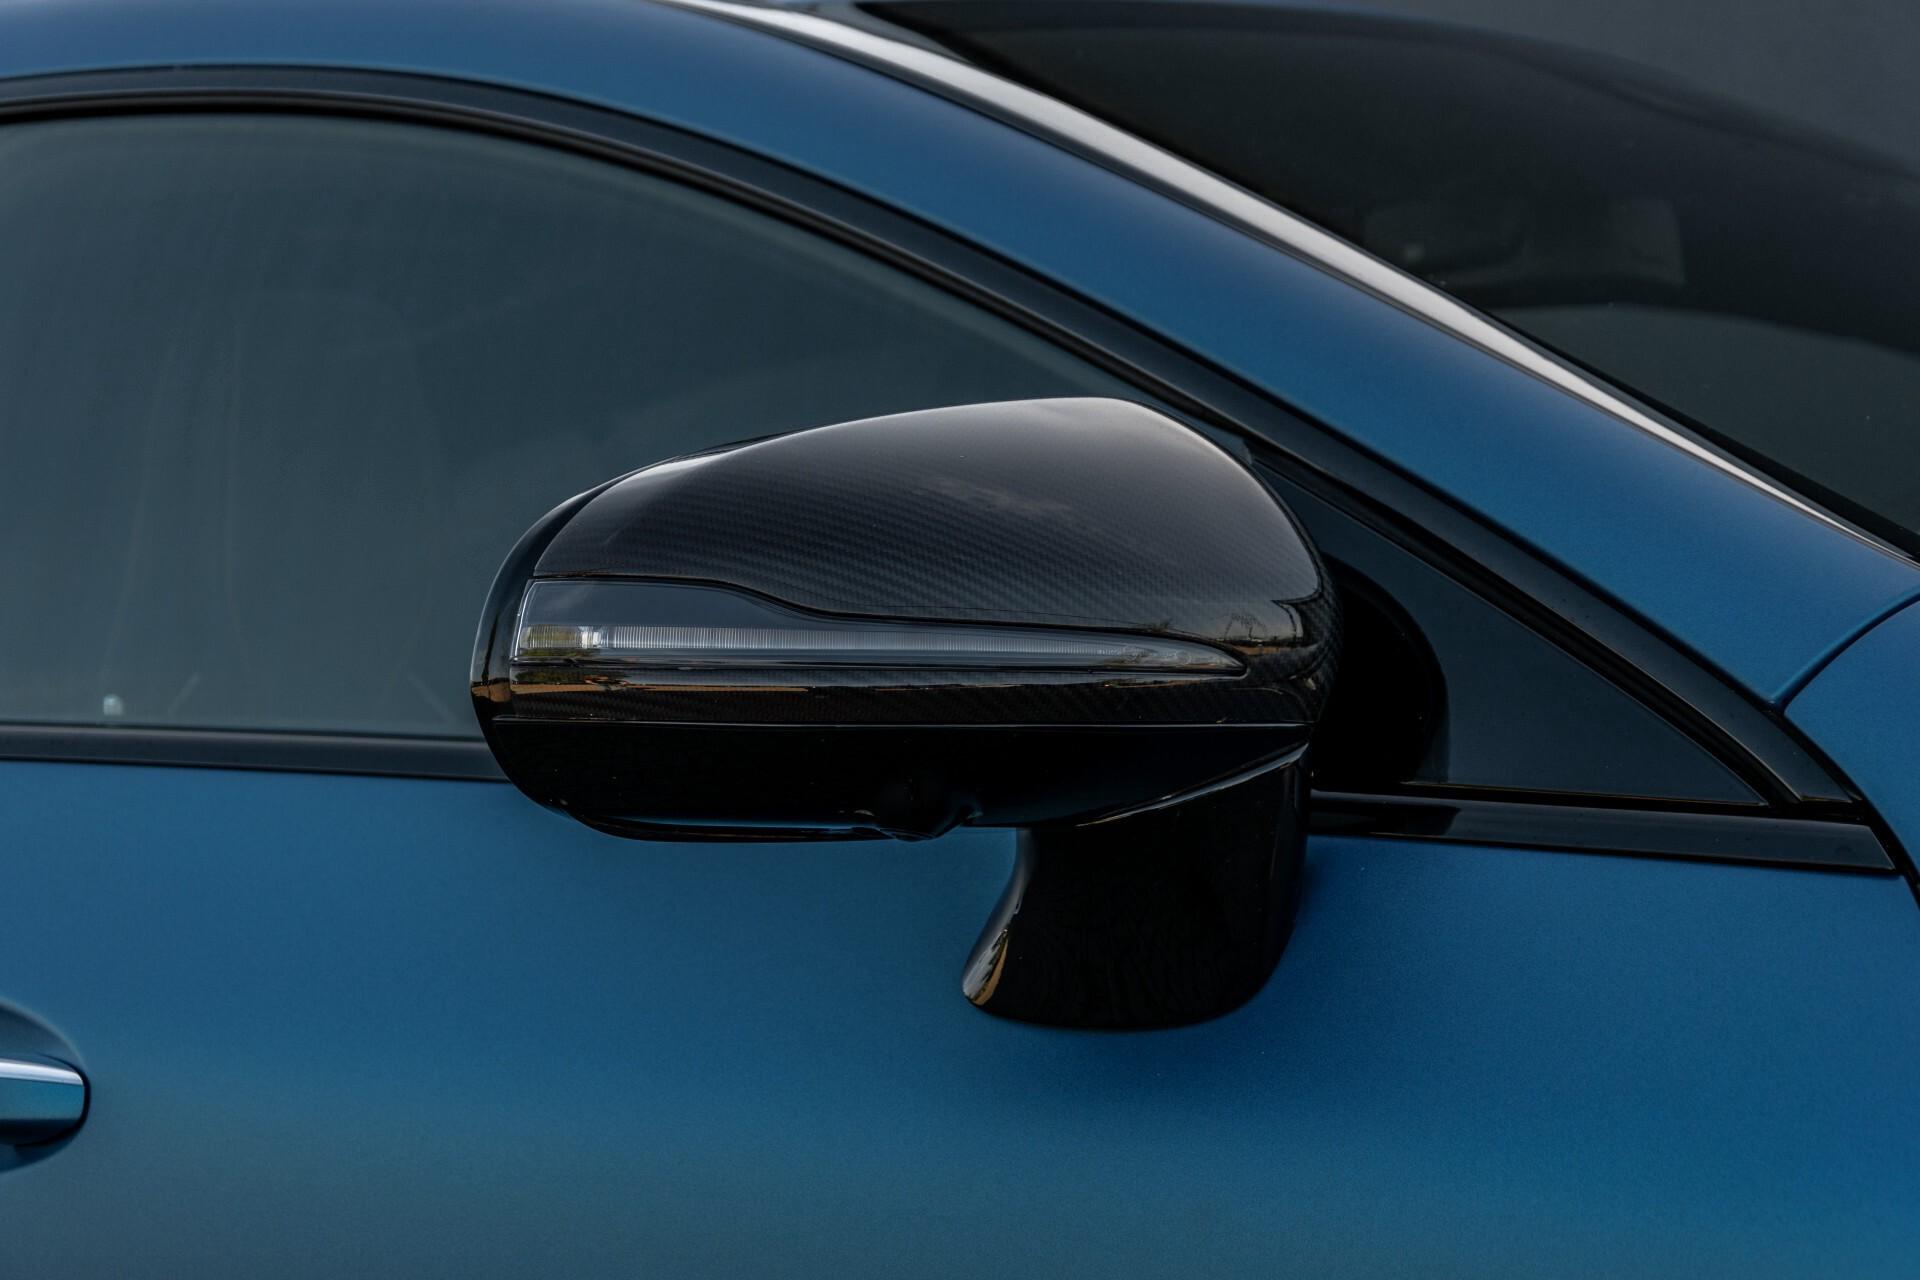 Mercedes-Benz AMG GT 4-Door Coupe 63 S 4MATIC+ Edition 1 Keramisch/Carbon/First Class/Dynamic Plus/Burmester High End 3D Aut9 Foto 84